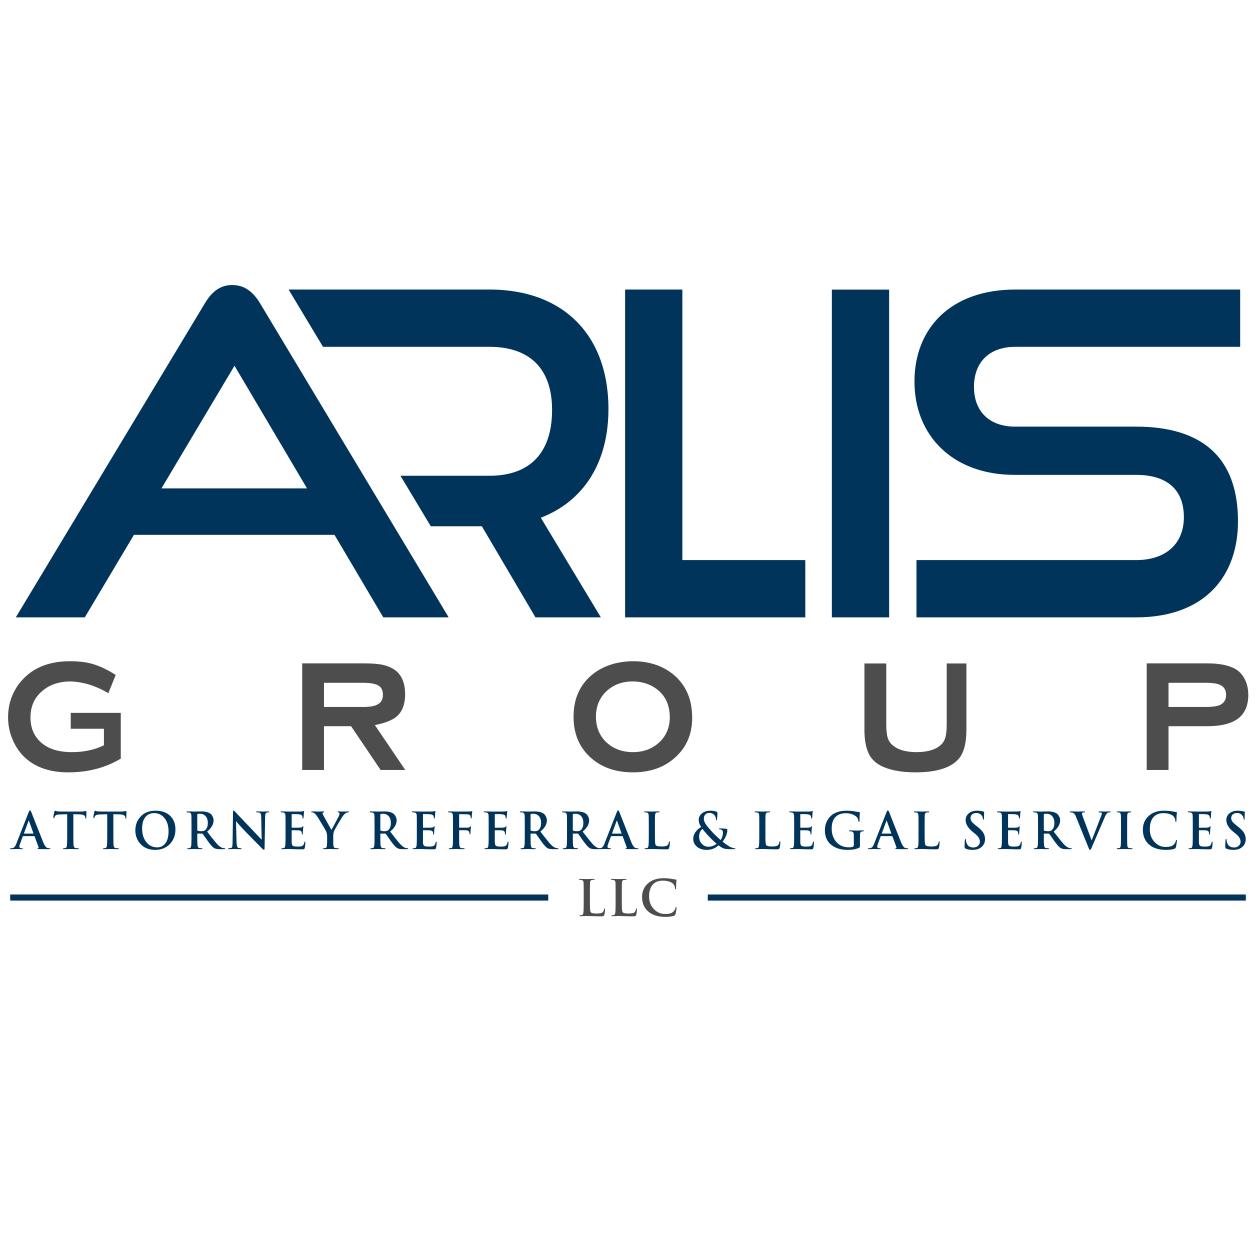 Attorney Referral & Legal Services, LLC